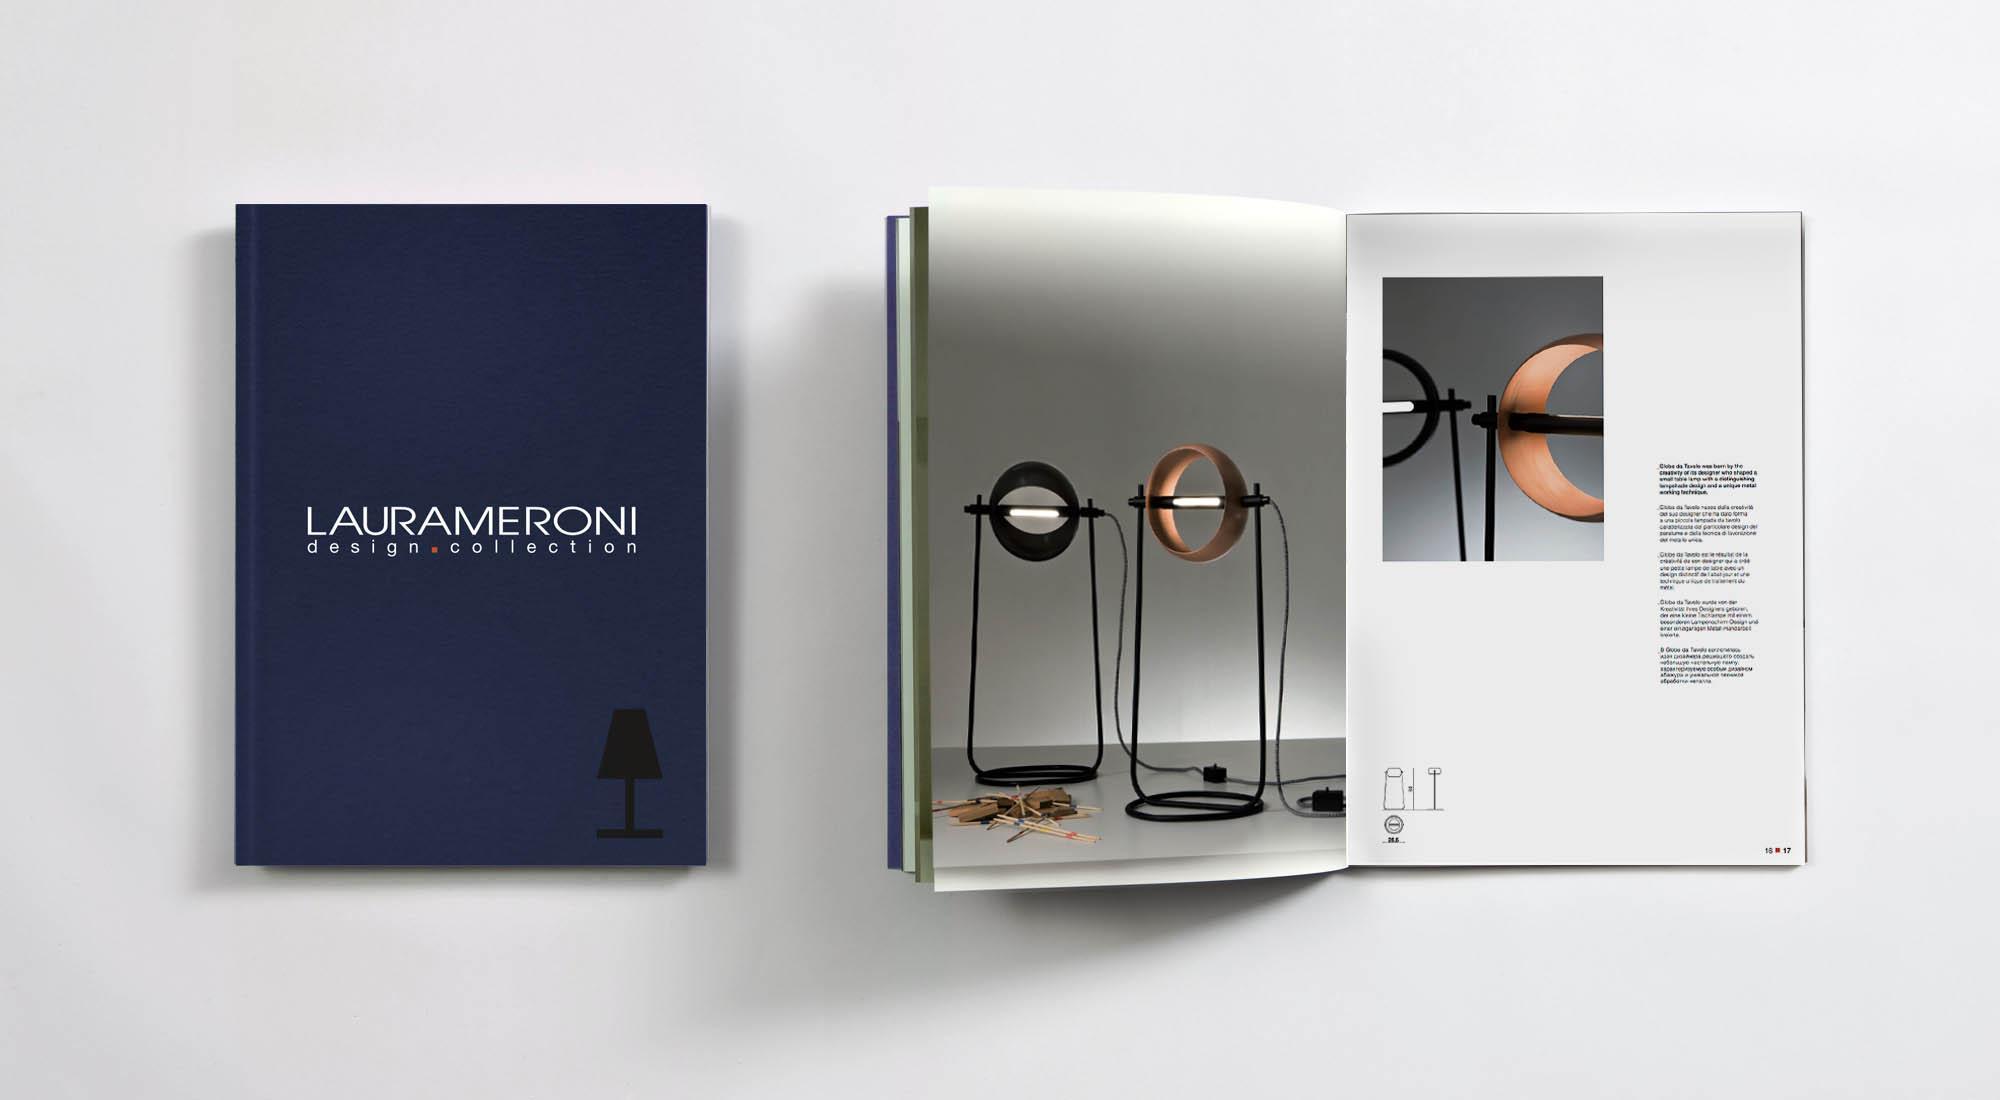 laurameroni free lighting catalogue download for luxury interior decor